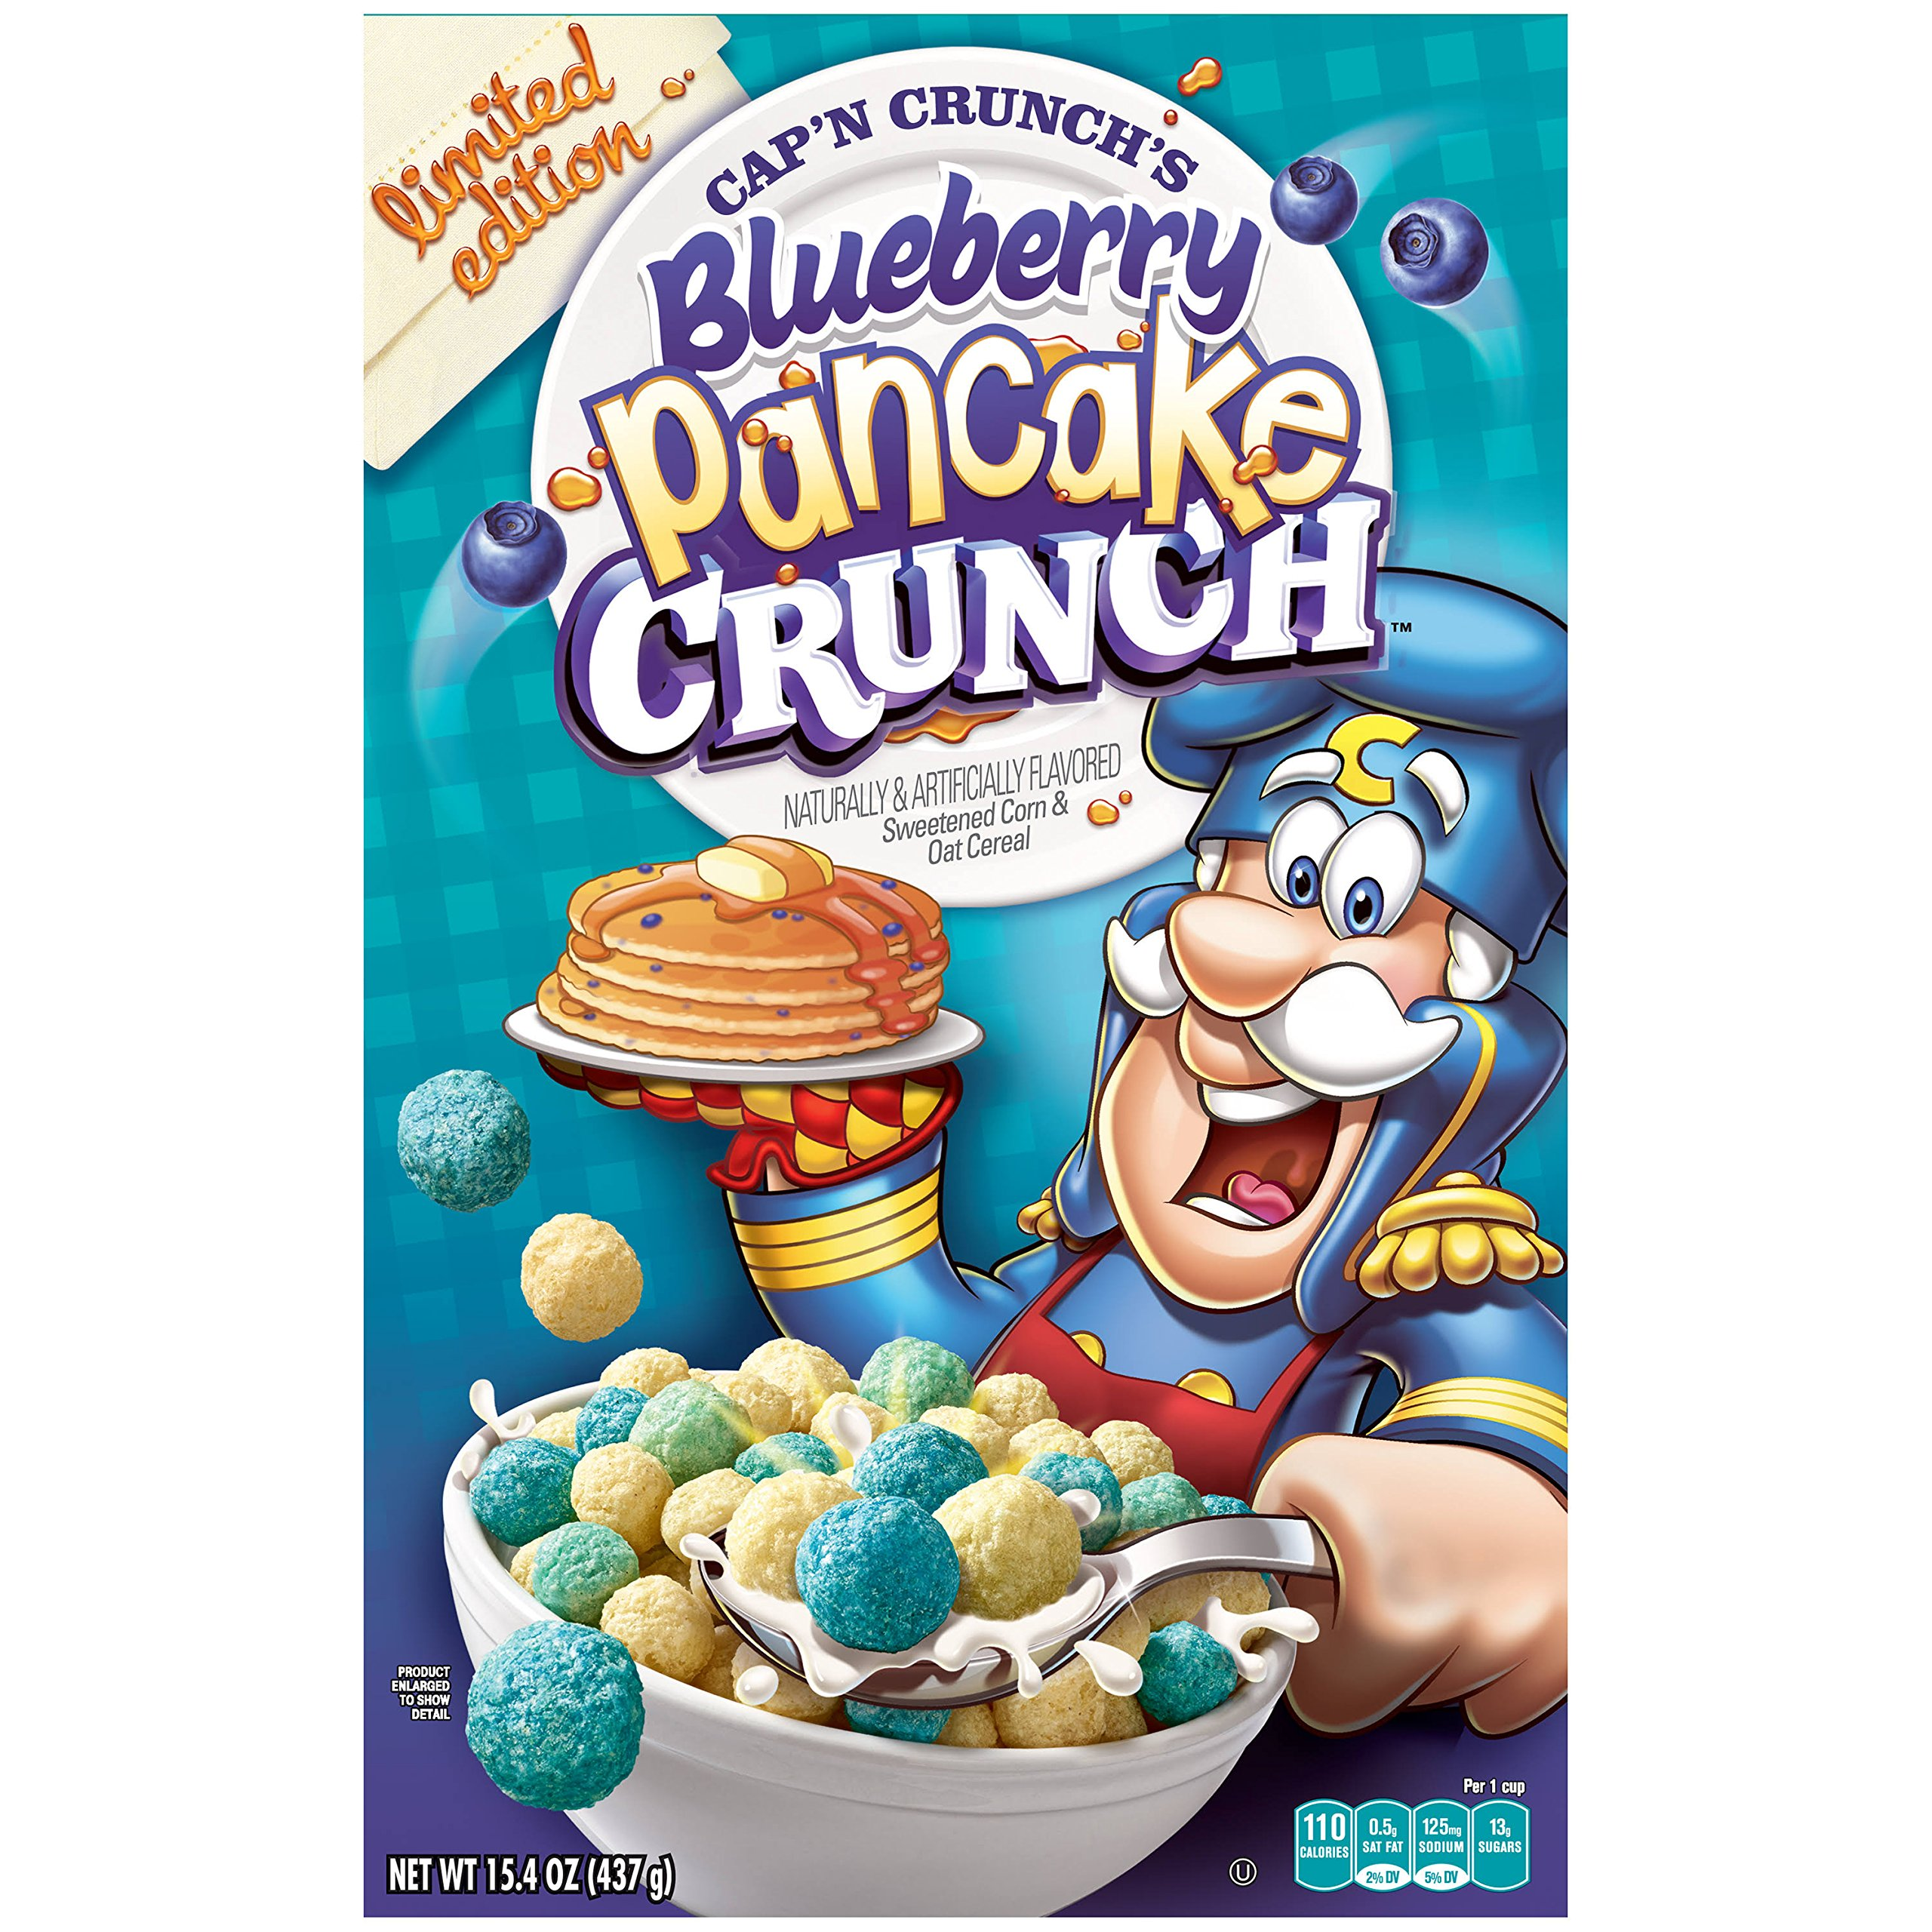 Amazon.com: Cap'n Crunch's Sprinkled Donut Crunch